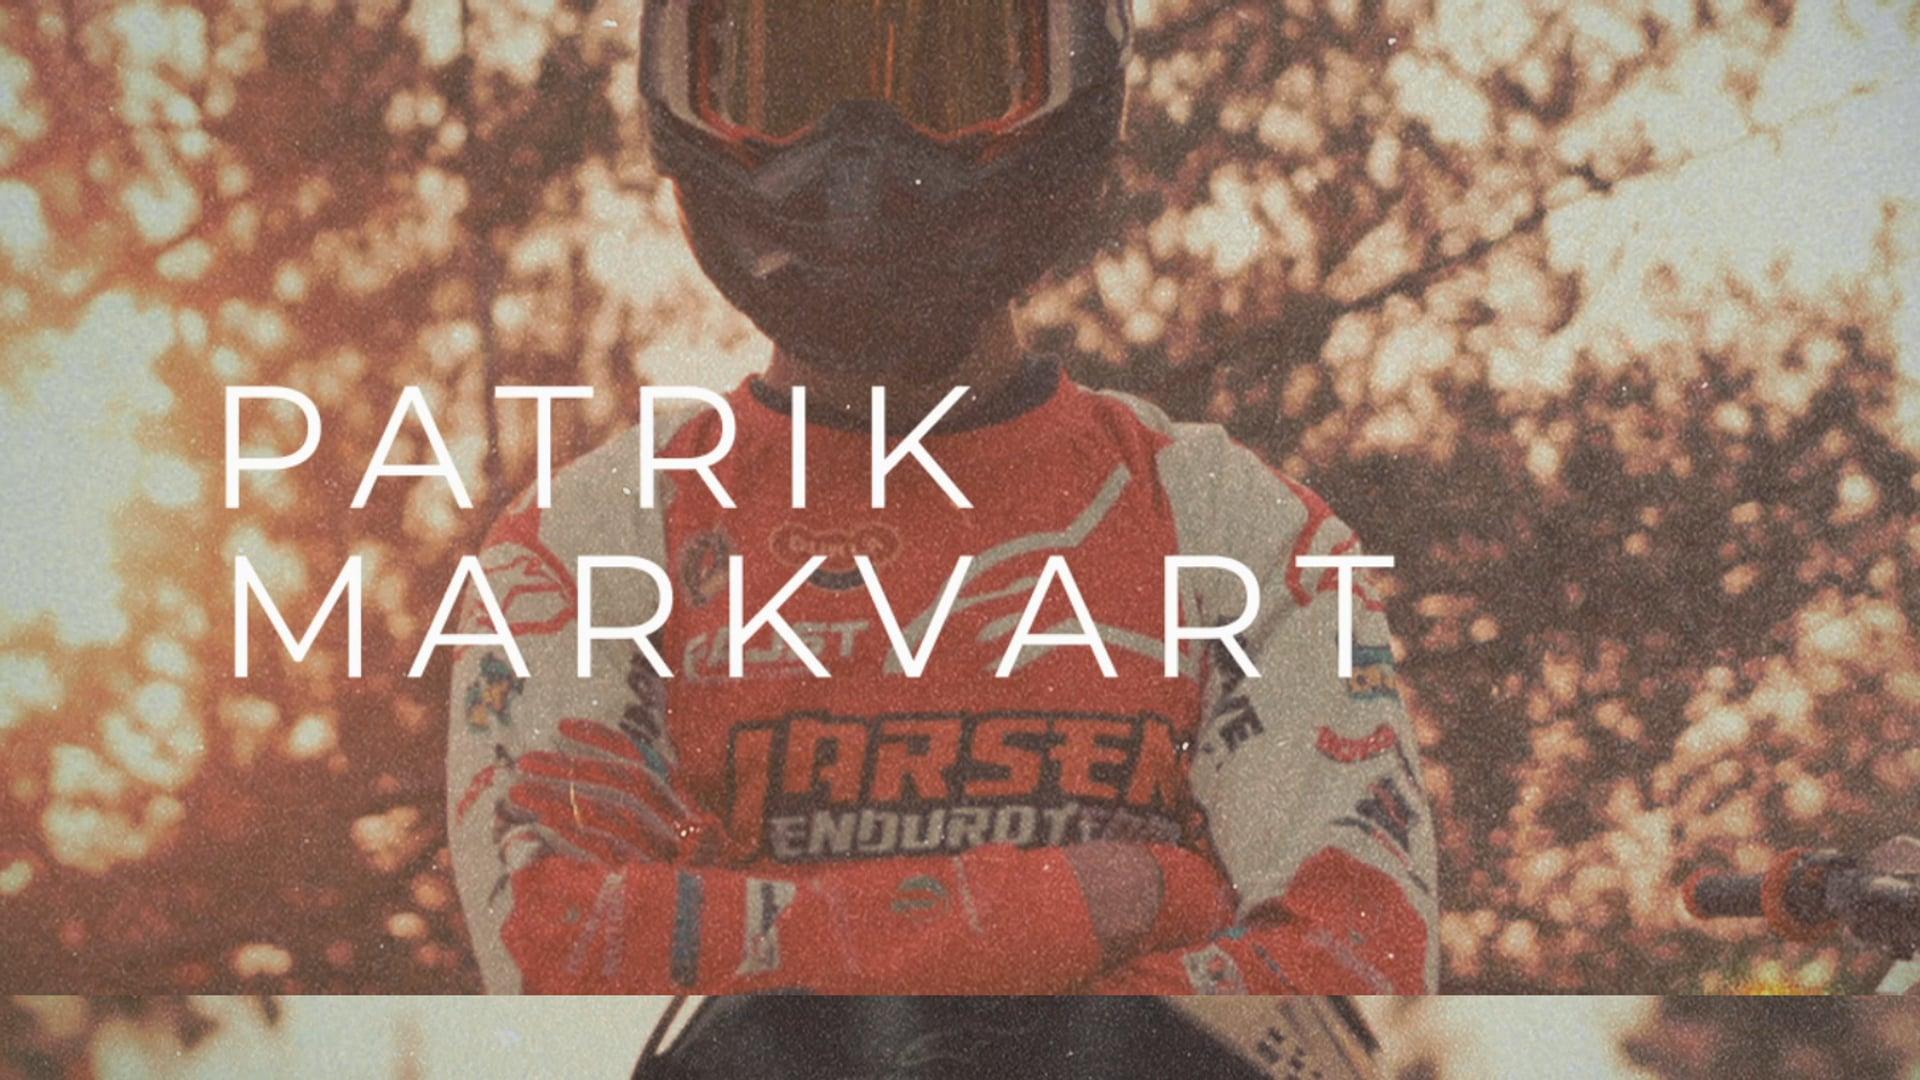 PATRIK MARKVART SEASON VIDEO